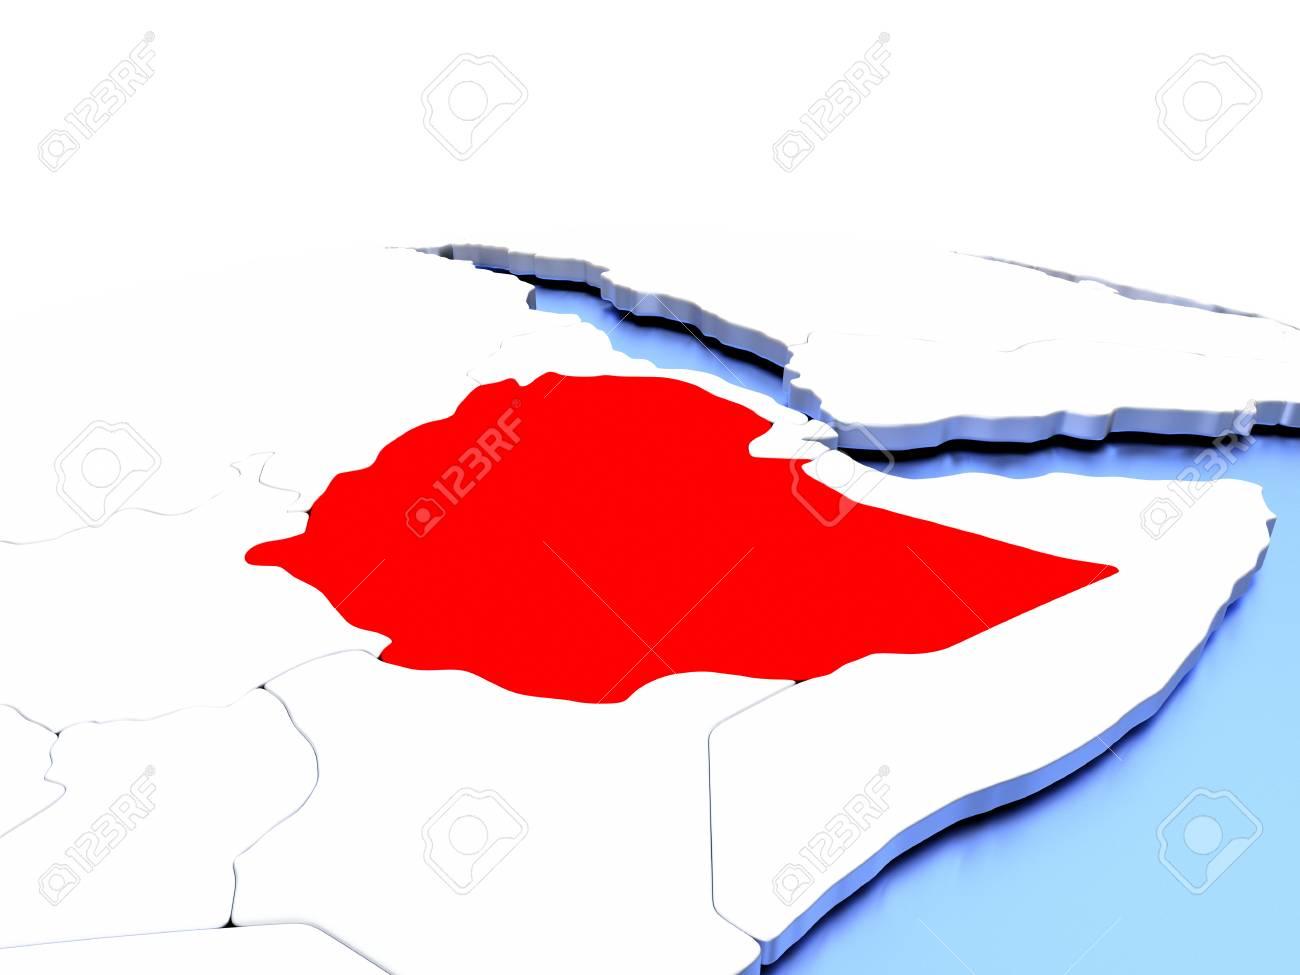 Simple Elegant Line Art : Ethiopia in red color on simple elegant political globe d